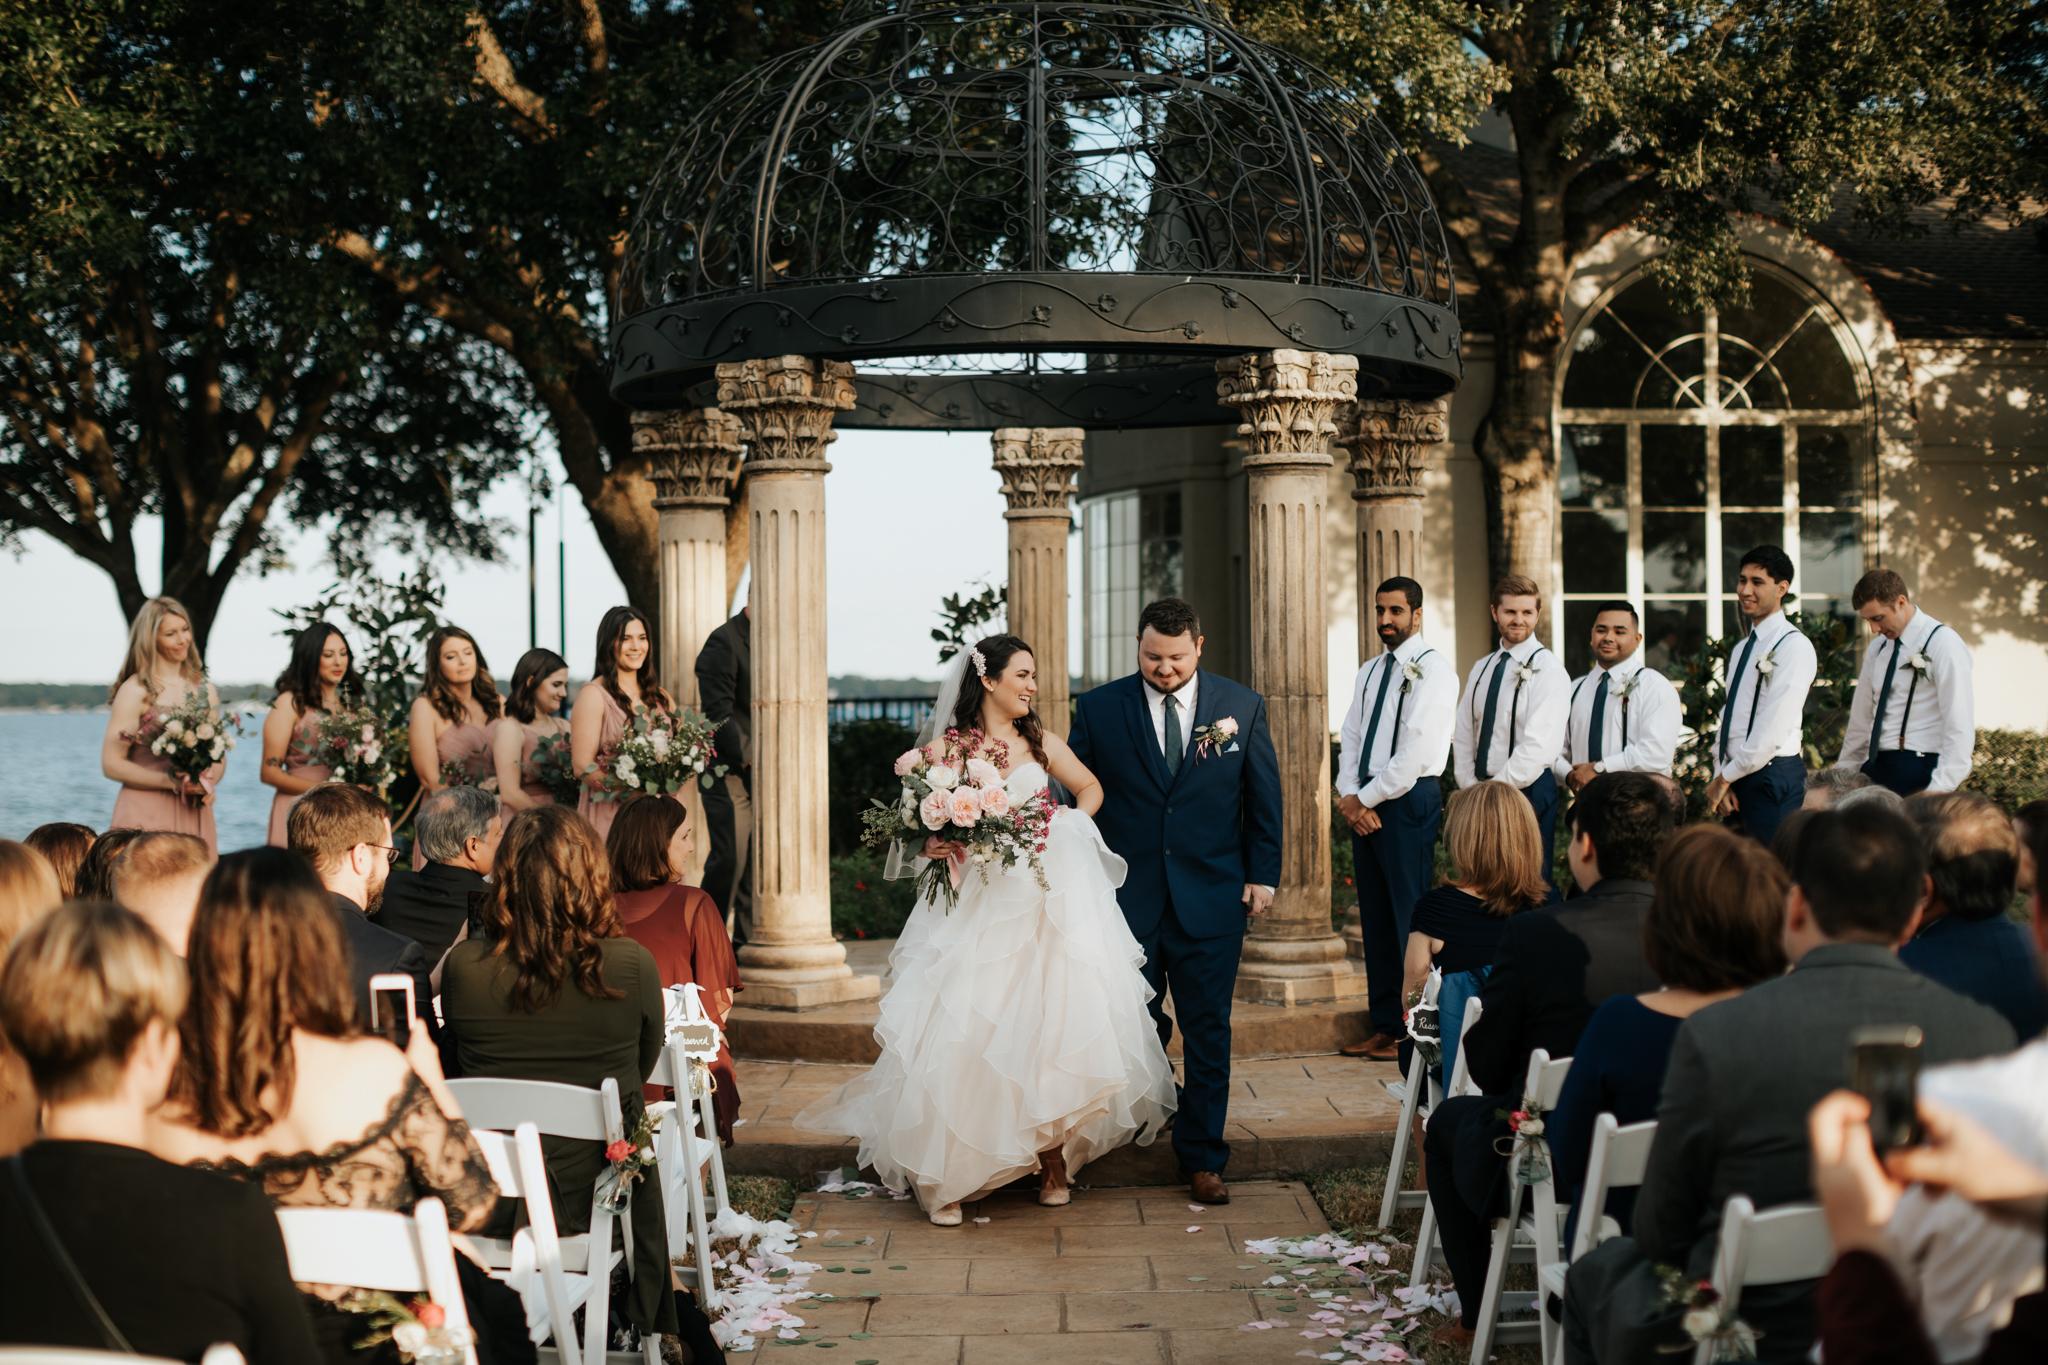 Leah Nicole Photography - Houston Wedding Photographer-Lake Conroe Wedding- Houston Wedding Photographer-35.jpg